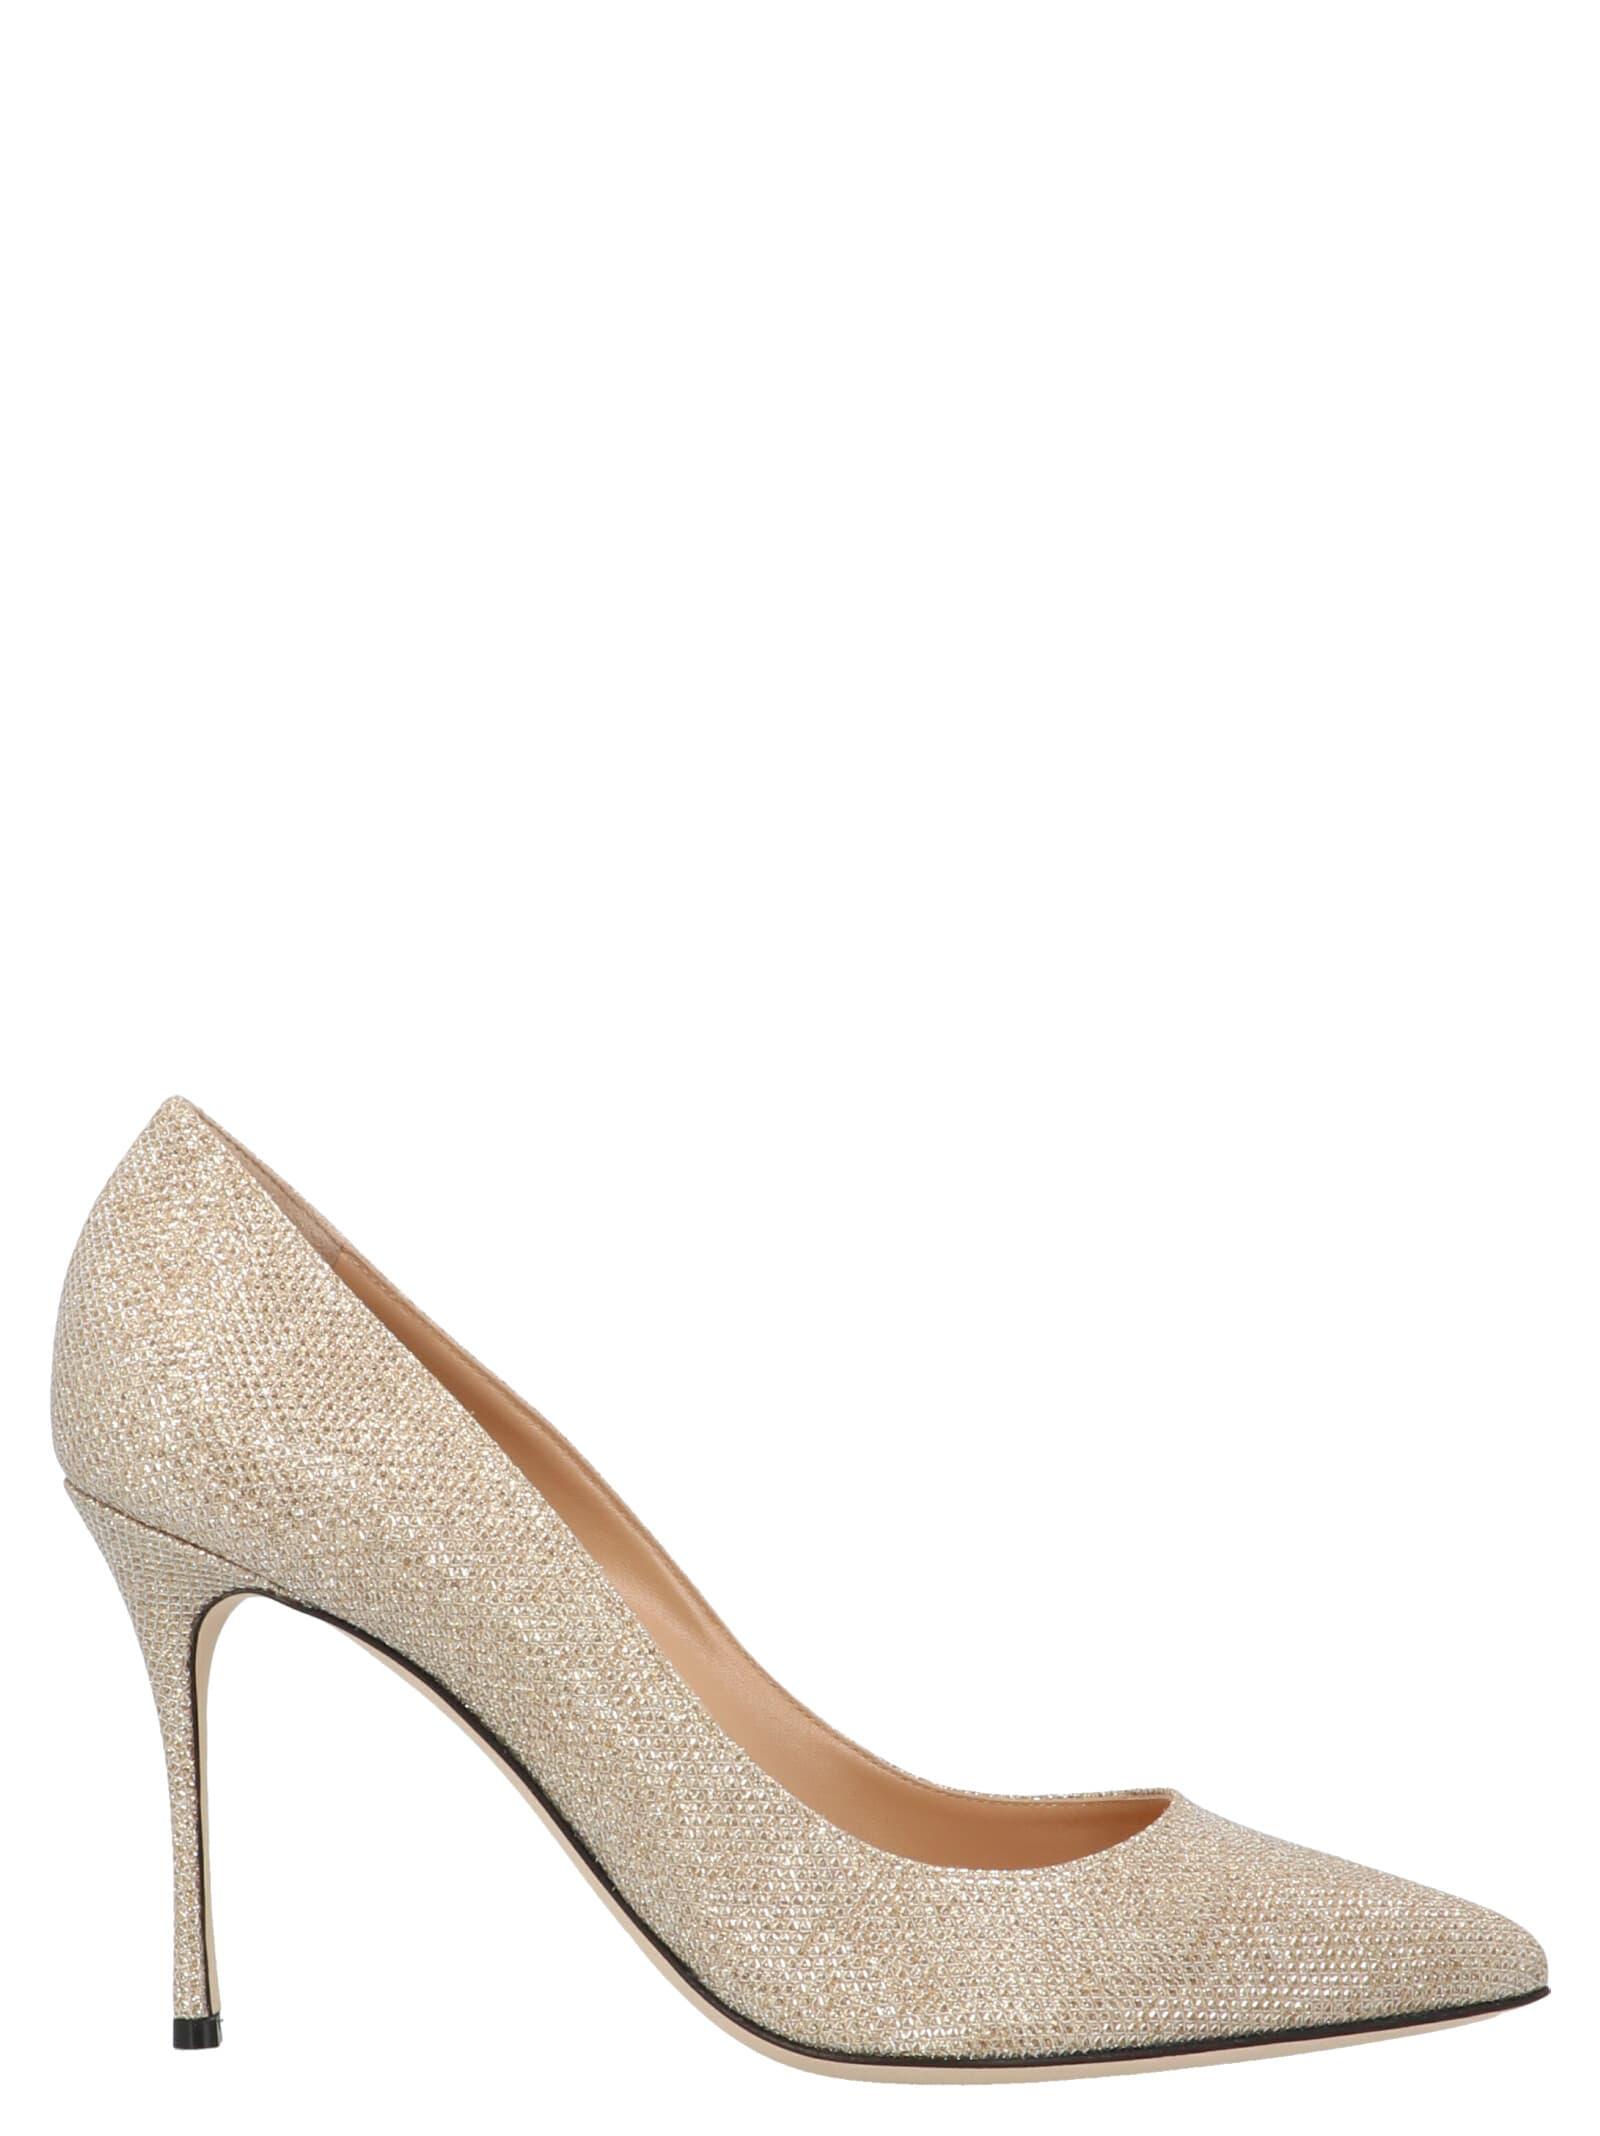 Sergio Rossi godiva Shoes